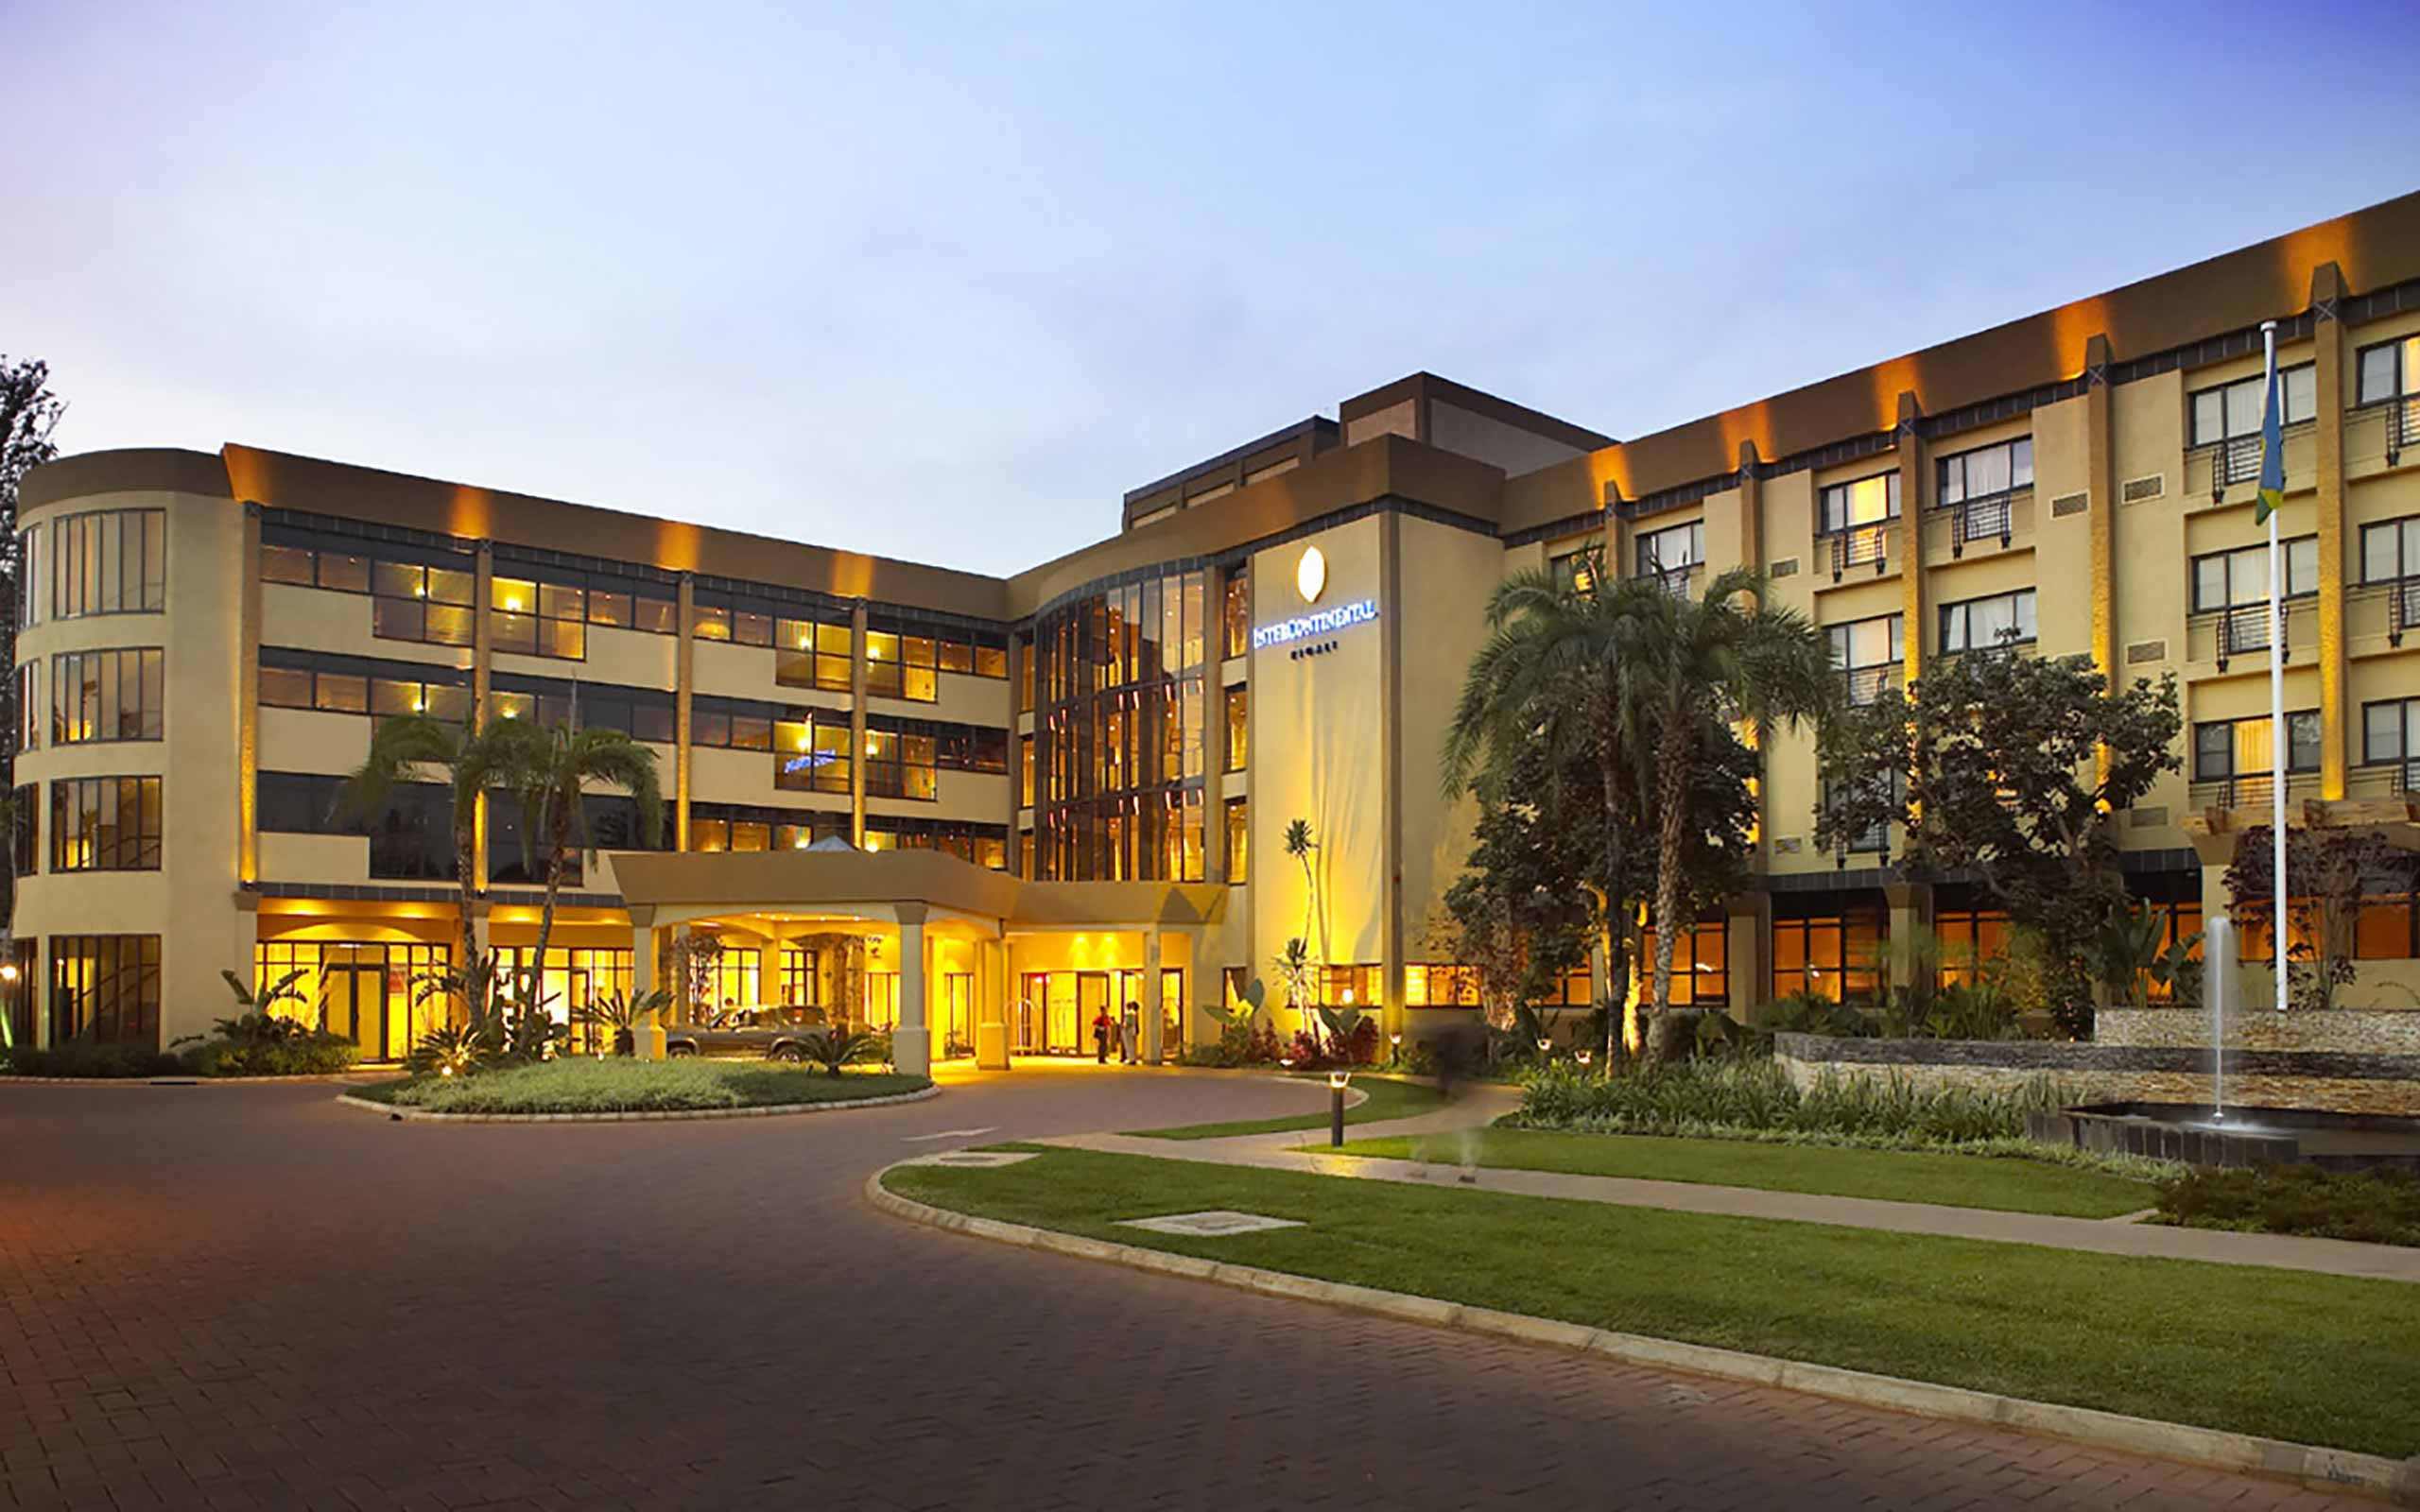 enkosi-africa-safari-rwanda-kigali-serena-hotel